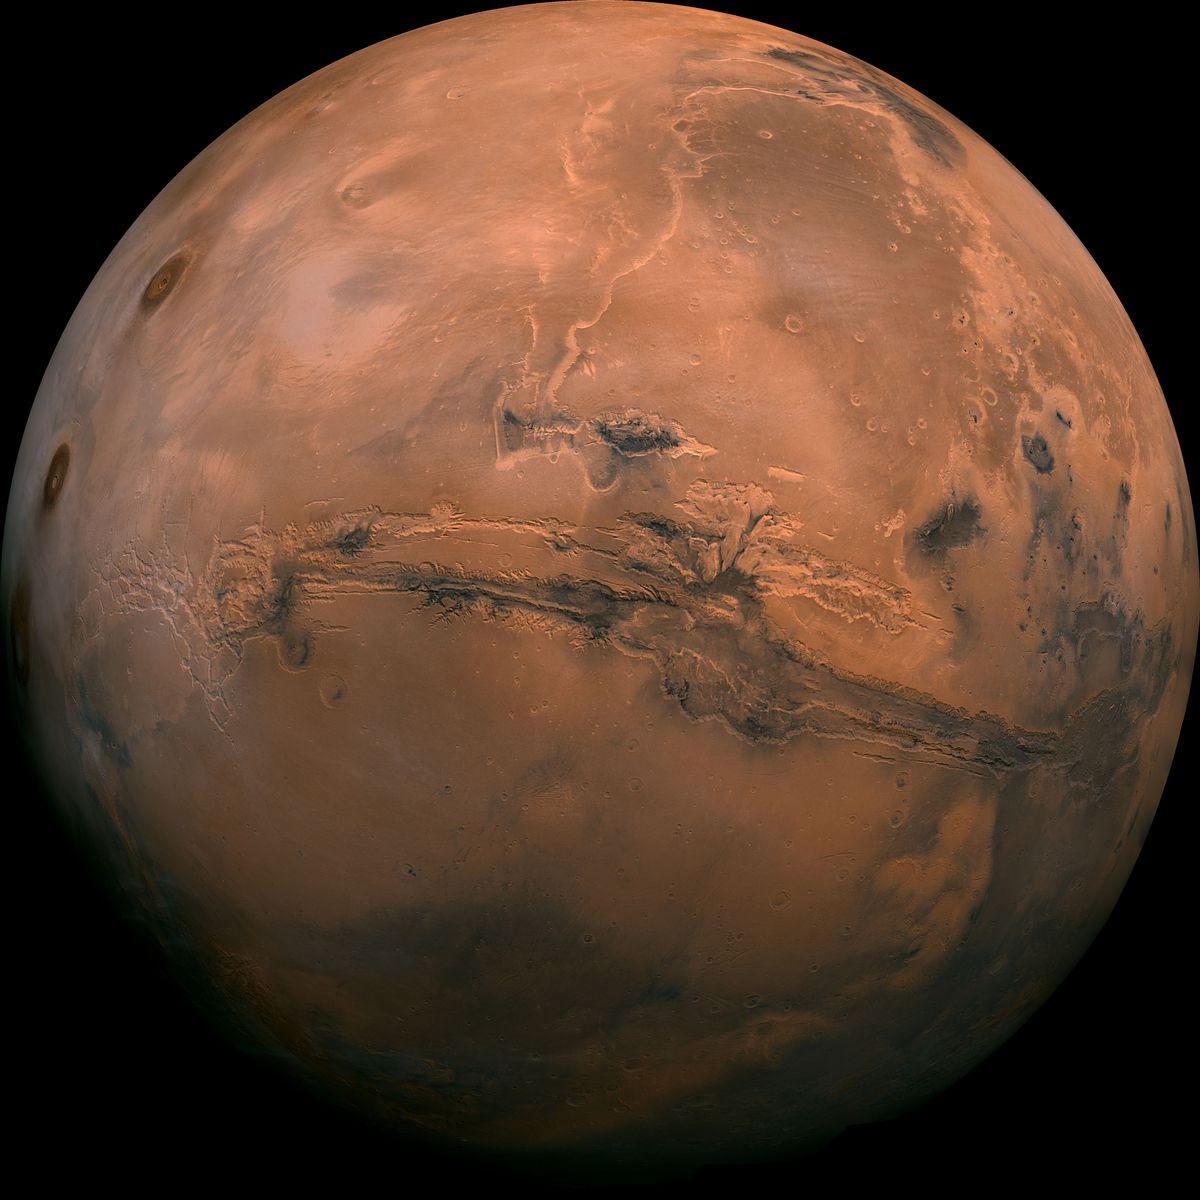 mars-globe-valles-marineris-enhanced-nasa